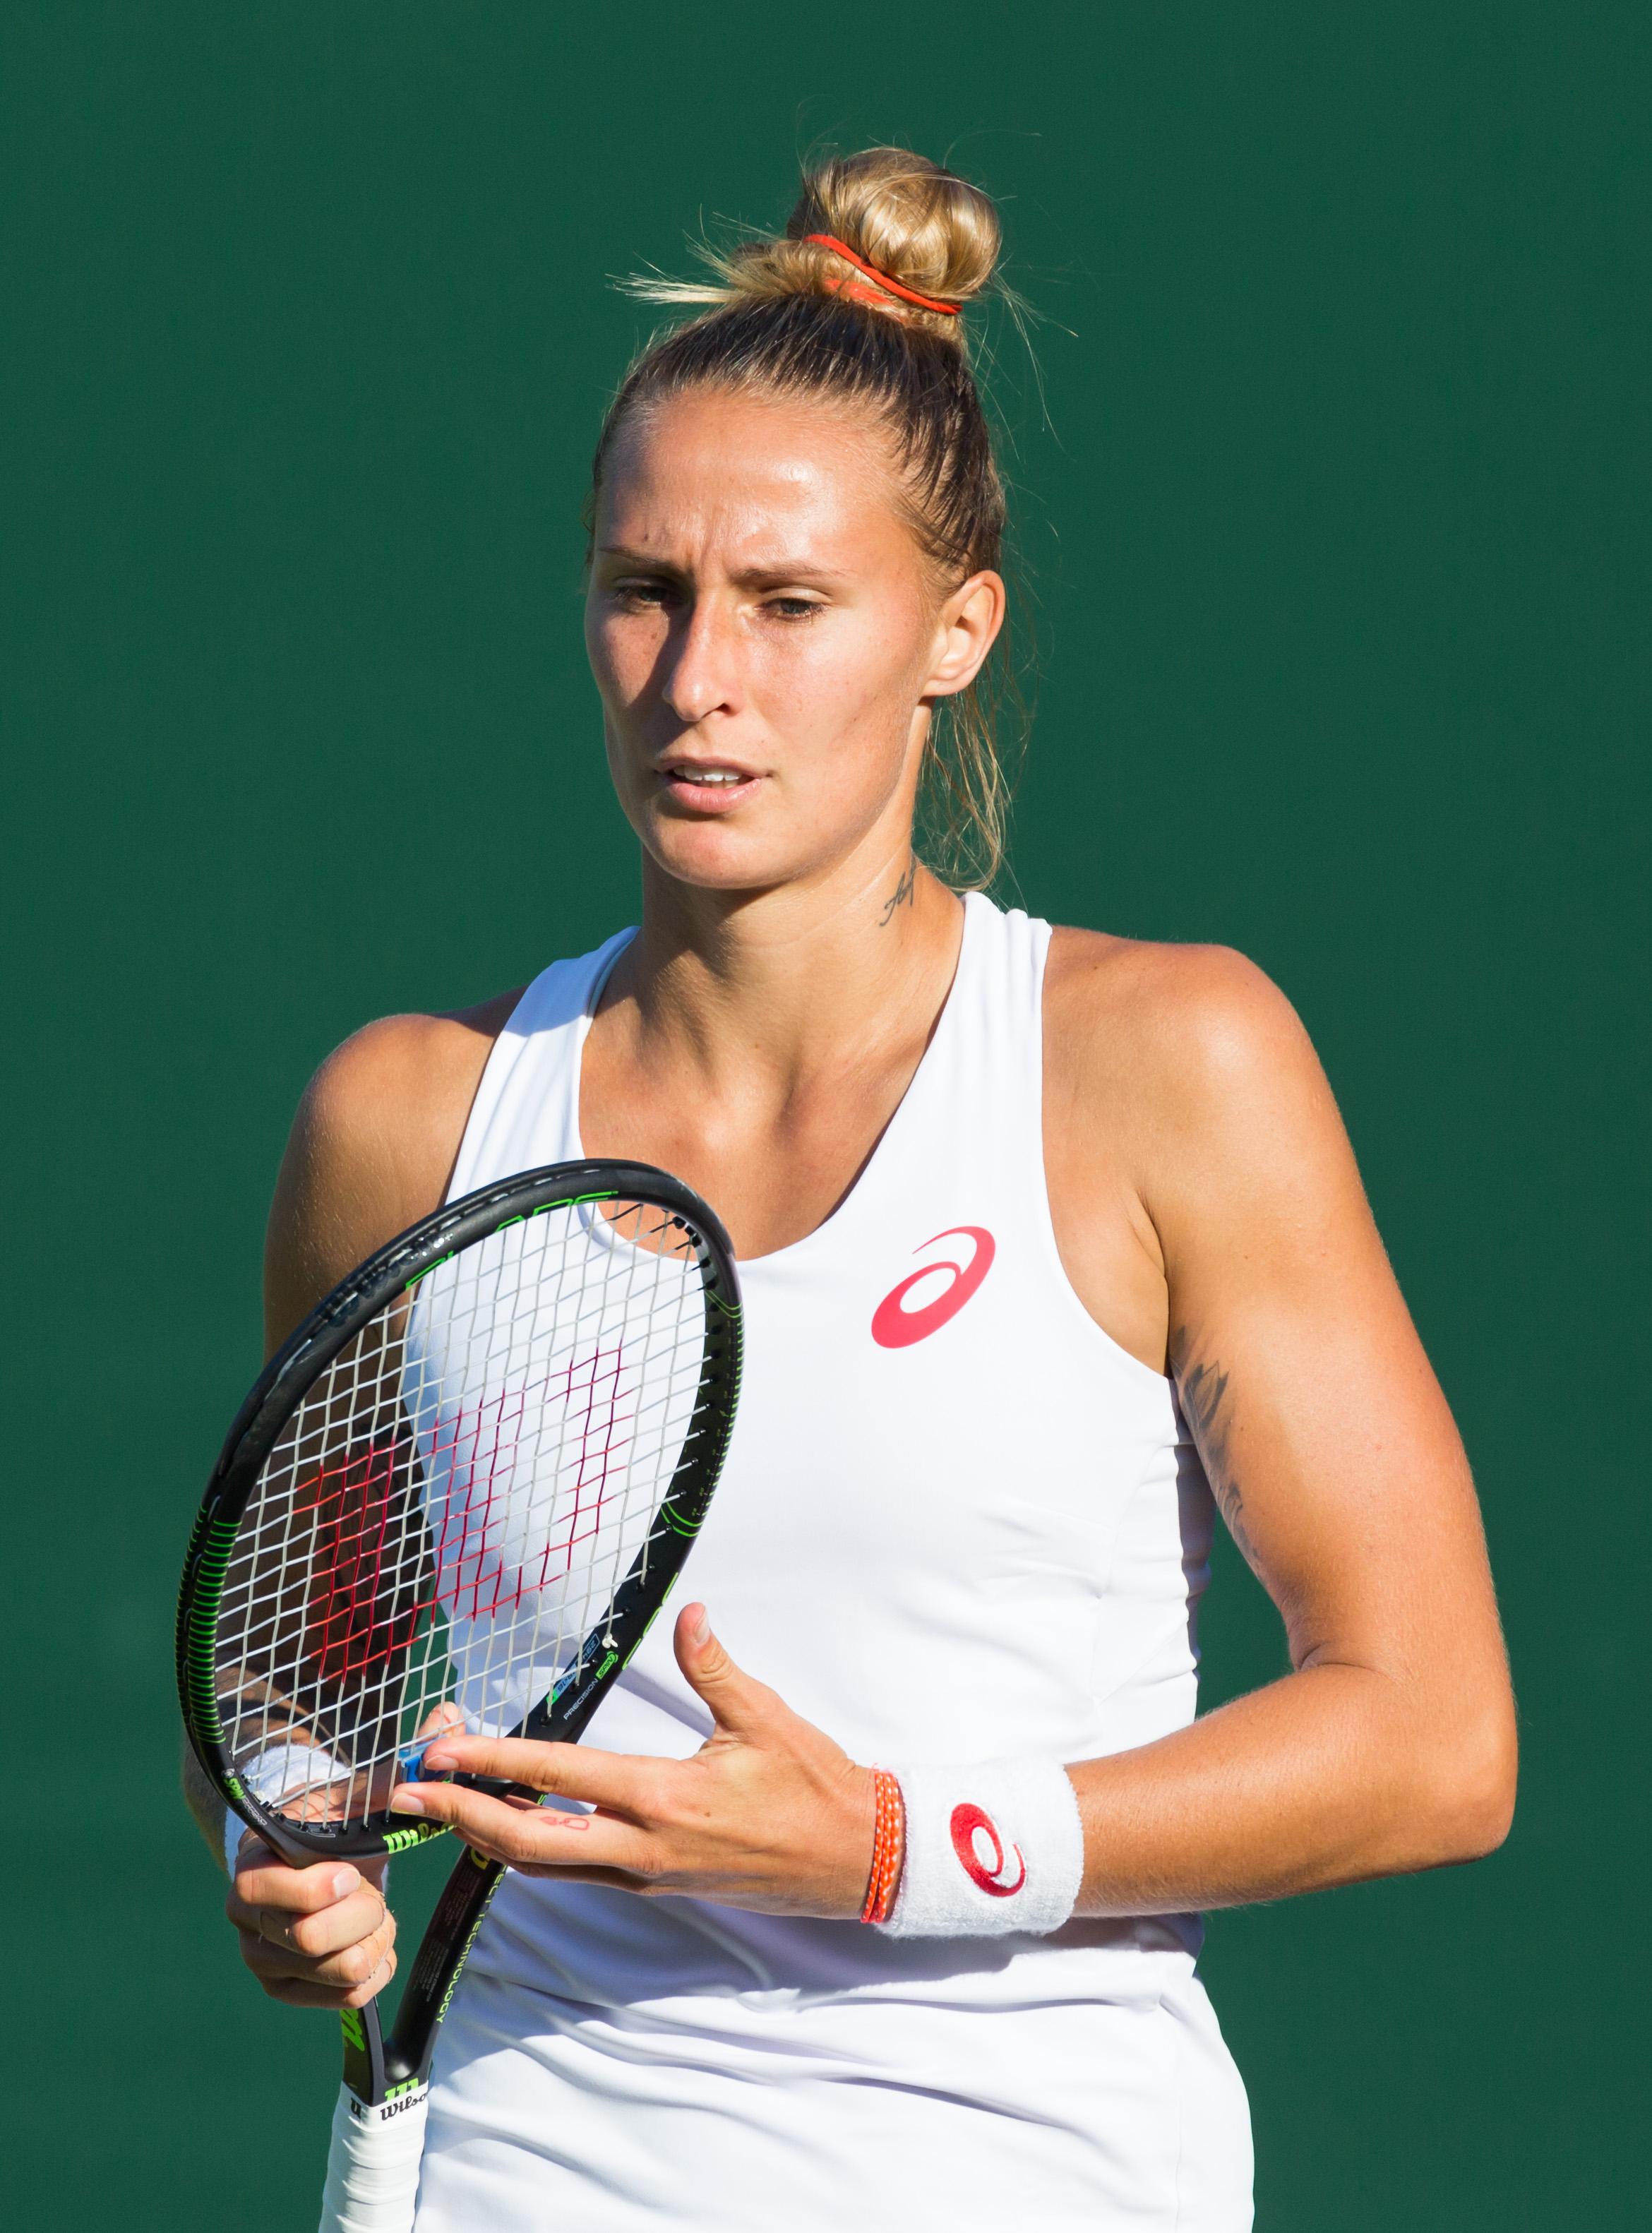 File:Polona Hercog, 2015 Wimbledon Championships - Diliff ...